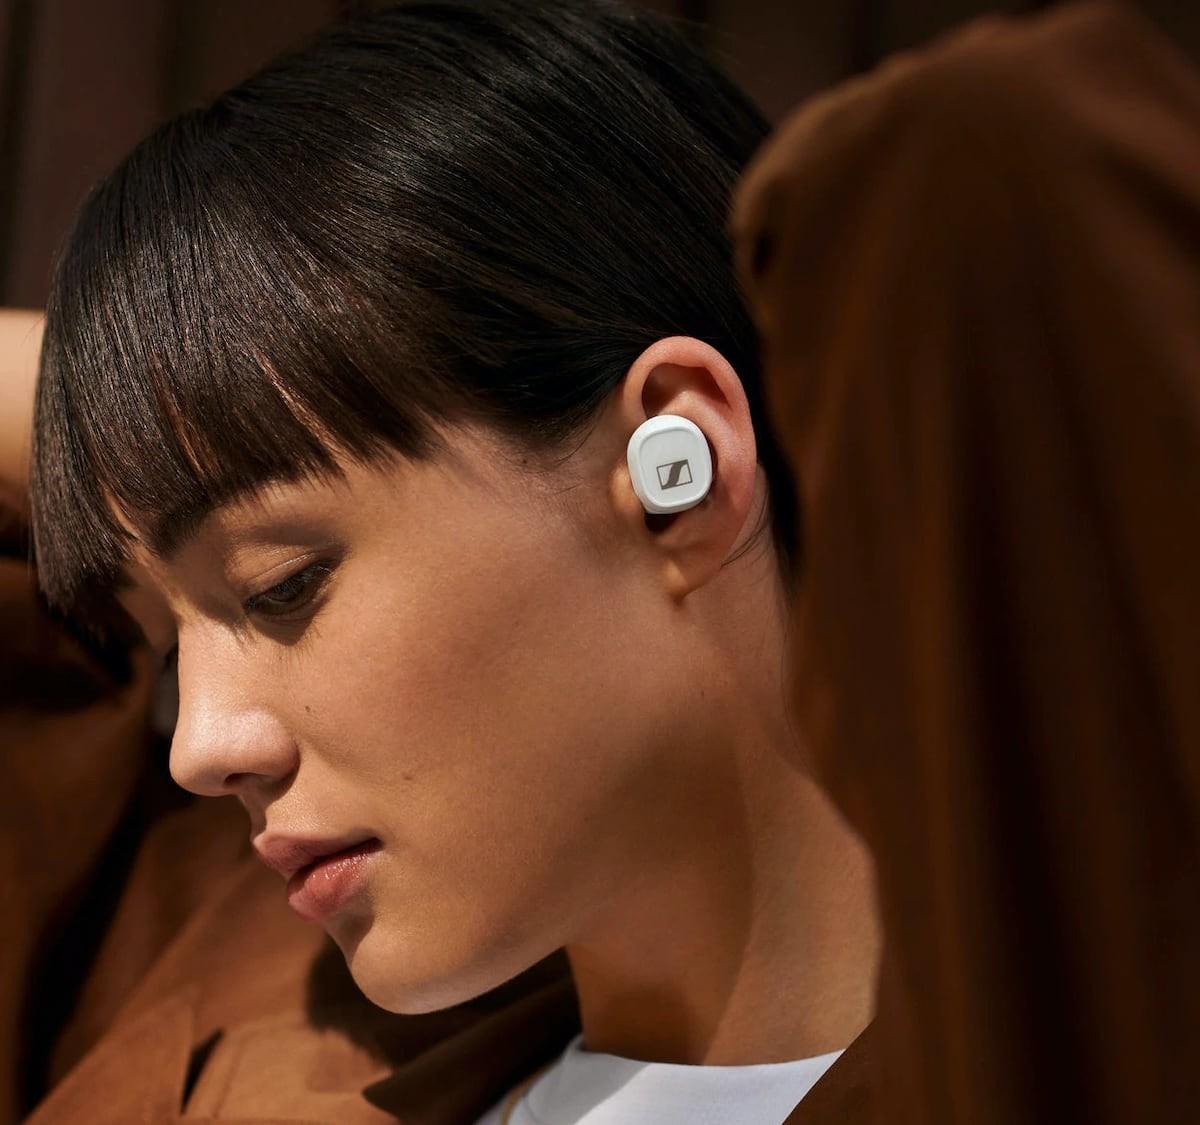 Sennheiser CX 400BT true wireless earbuds offer up to 20 hours of battery life